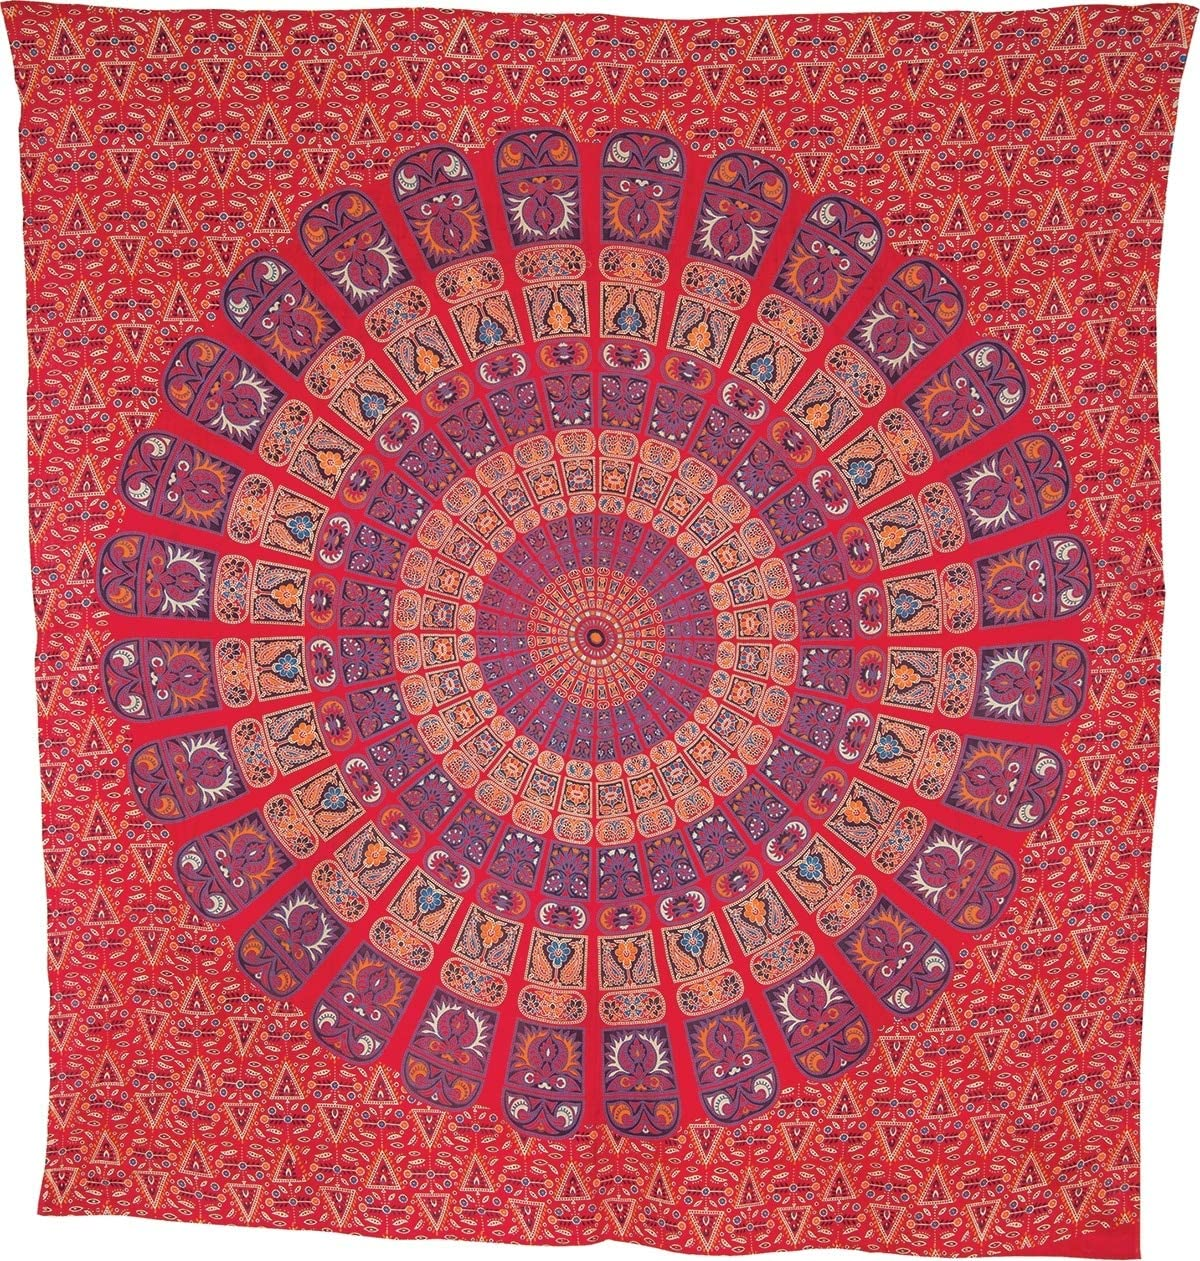 Luna Bazaar Deesa Bohemian Mandala Tapestry, Wall Hanging and Bedspread Large, 7 X 8 Feet, Red and Purple, 100 Cotton, Fair Trade Certified